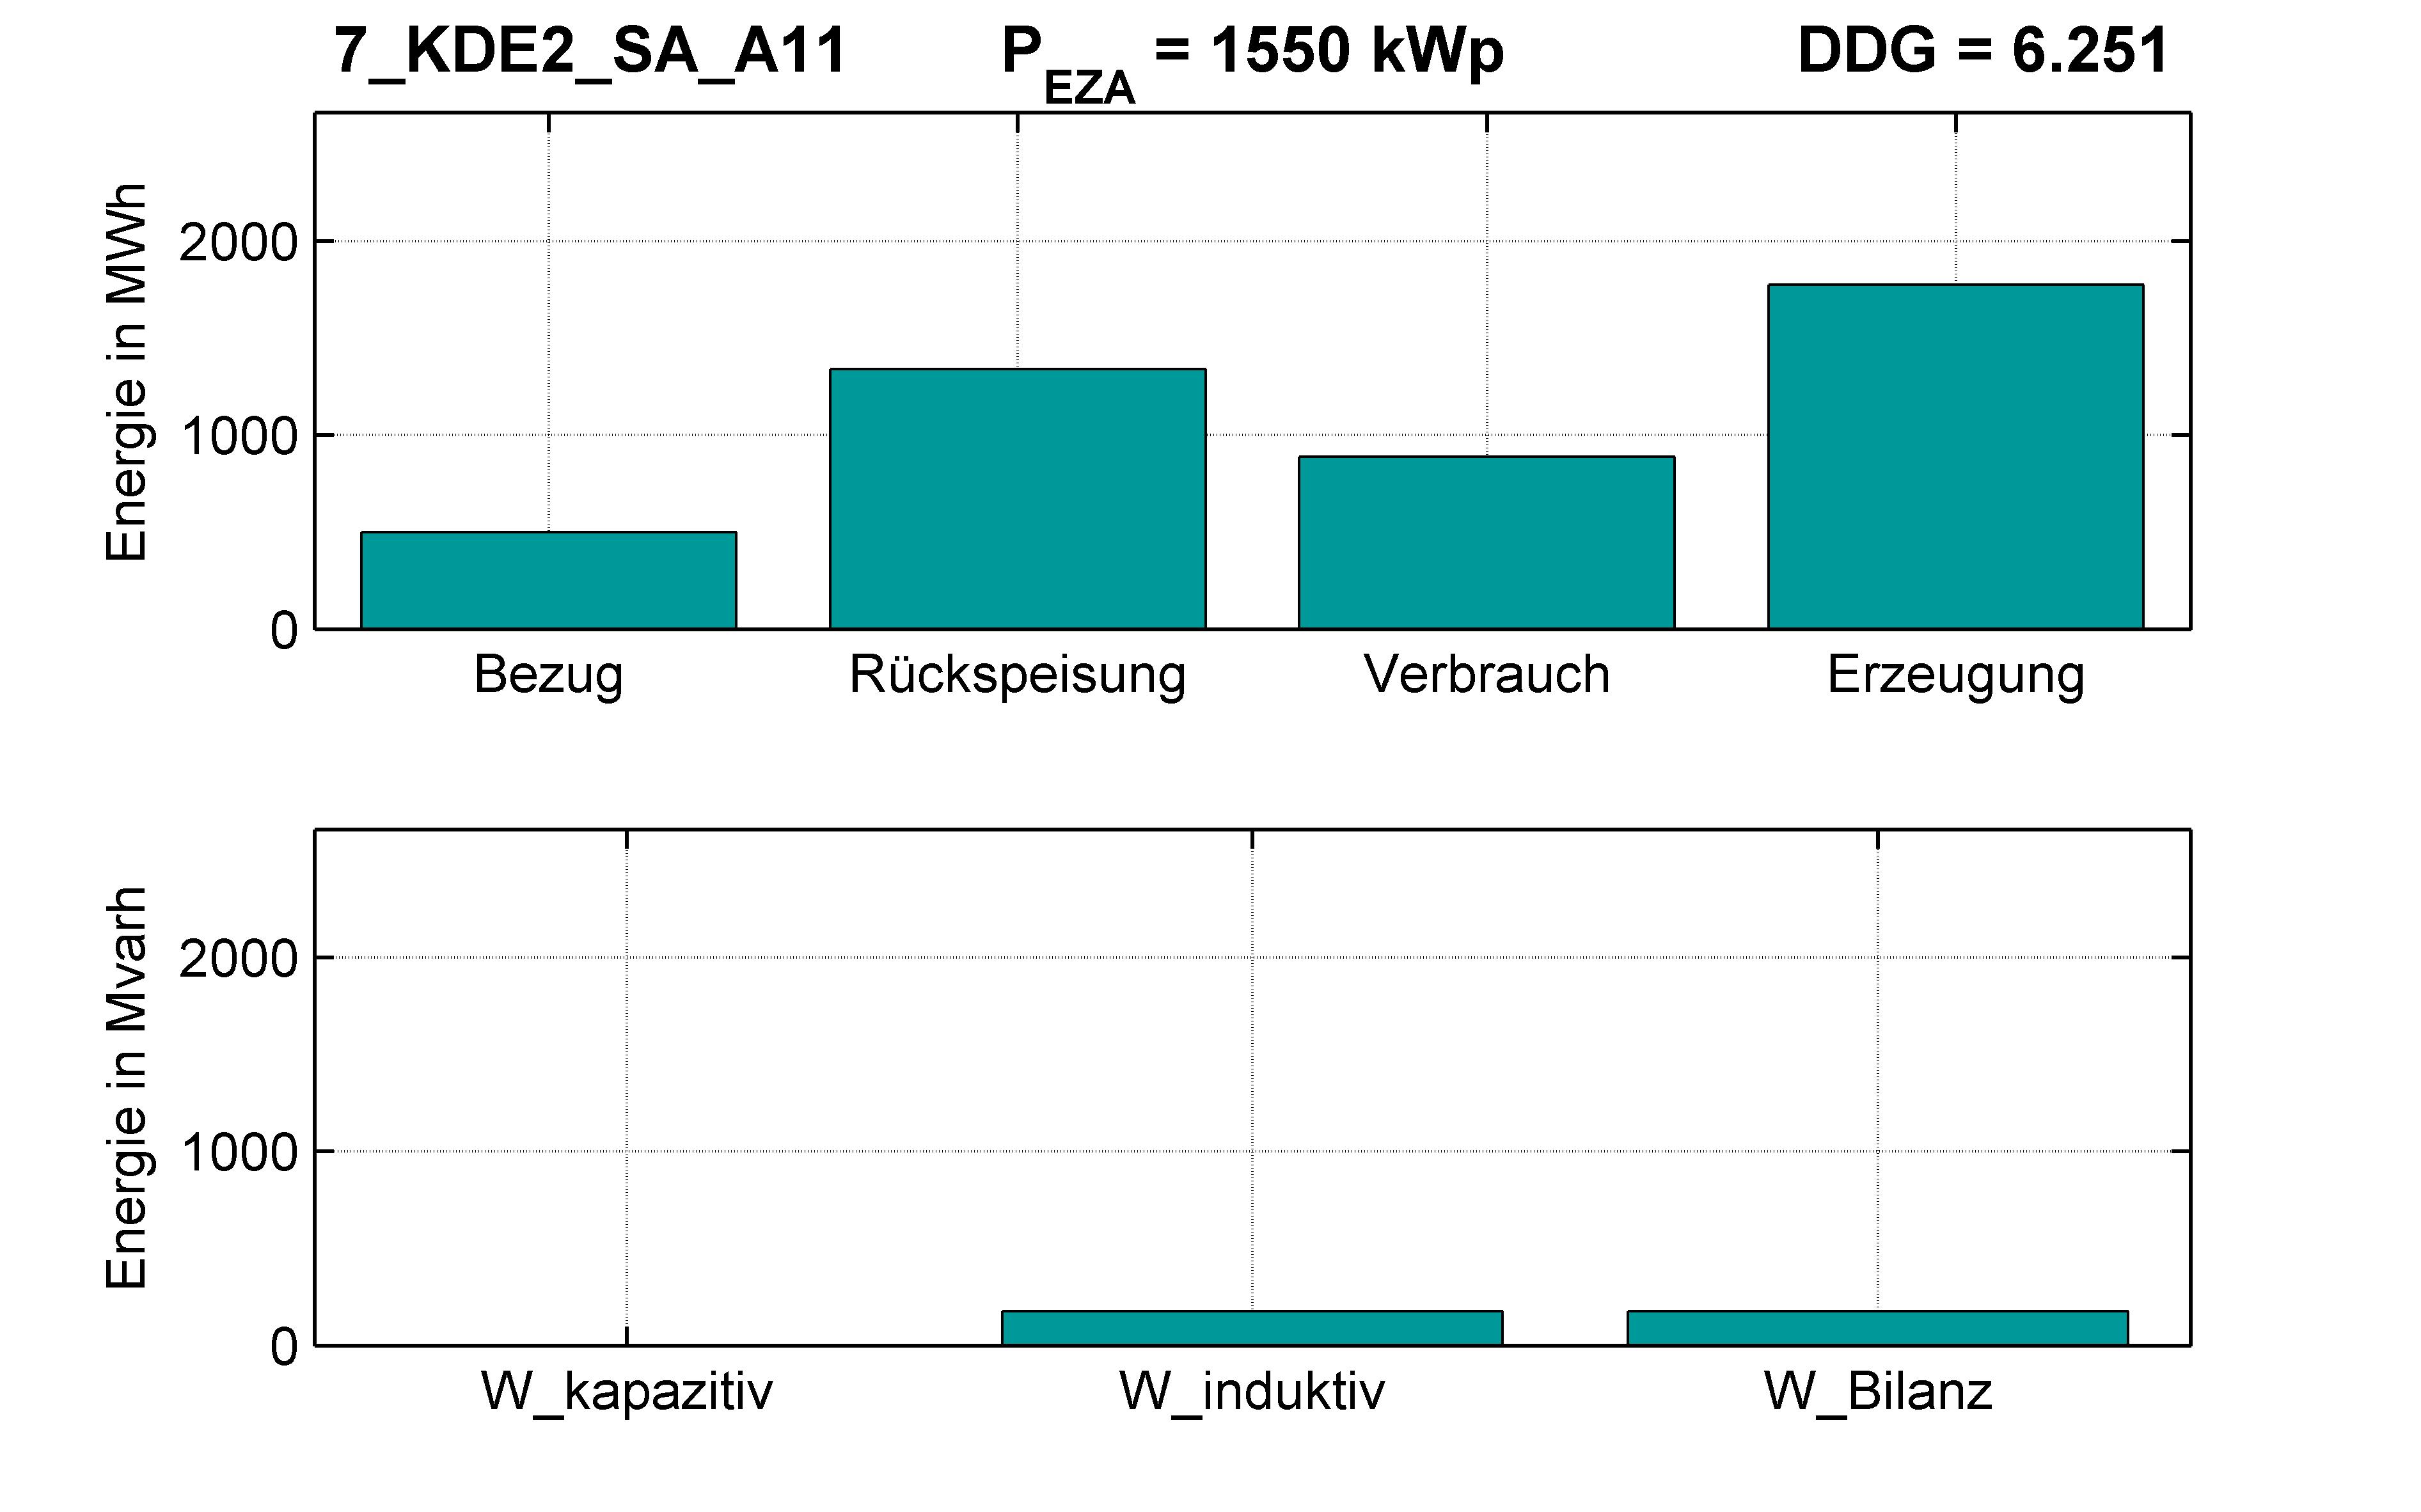 KDE2 | Längsregler (SA) A11 | PQ-Bilanz